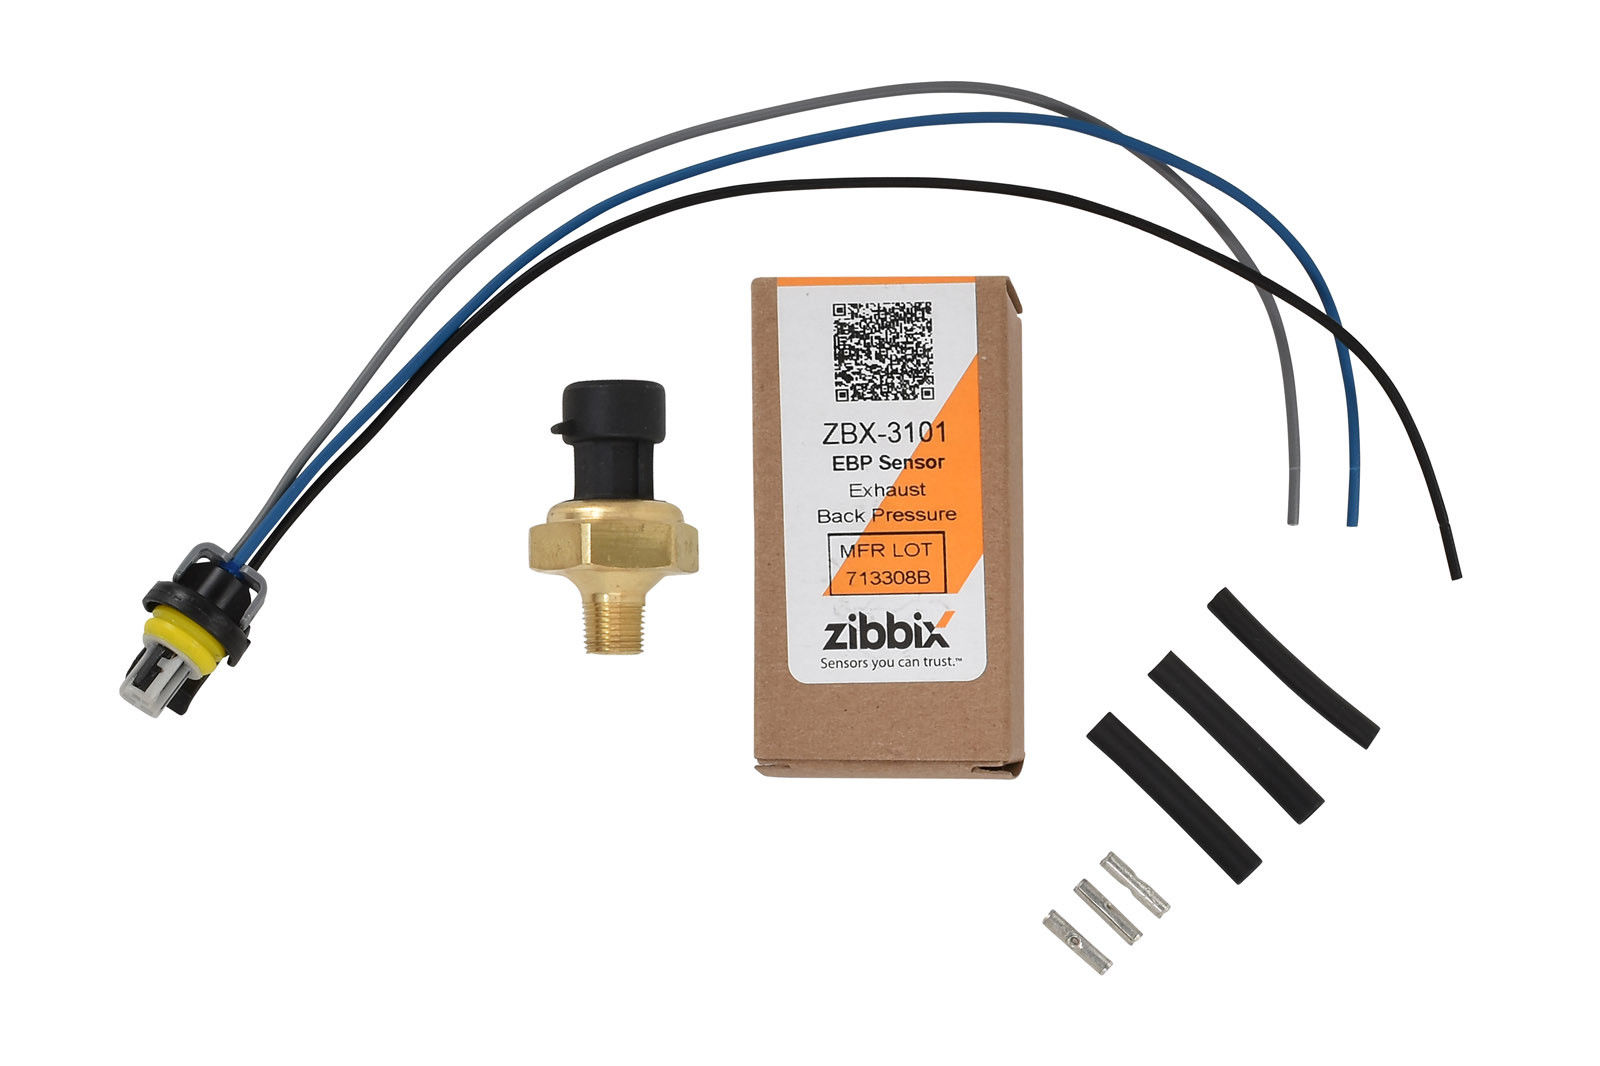 Zibbix ZBX-3101-PK4 EBP Exhaust Back Pressure Sensor Pigtail Kit For 94-04 7.3L 6.0L Ford Powerstroke Diesel